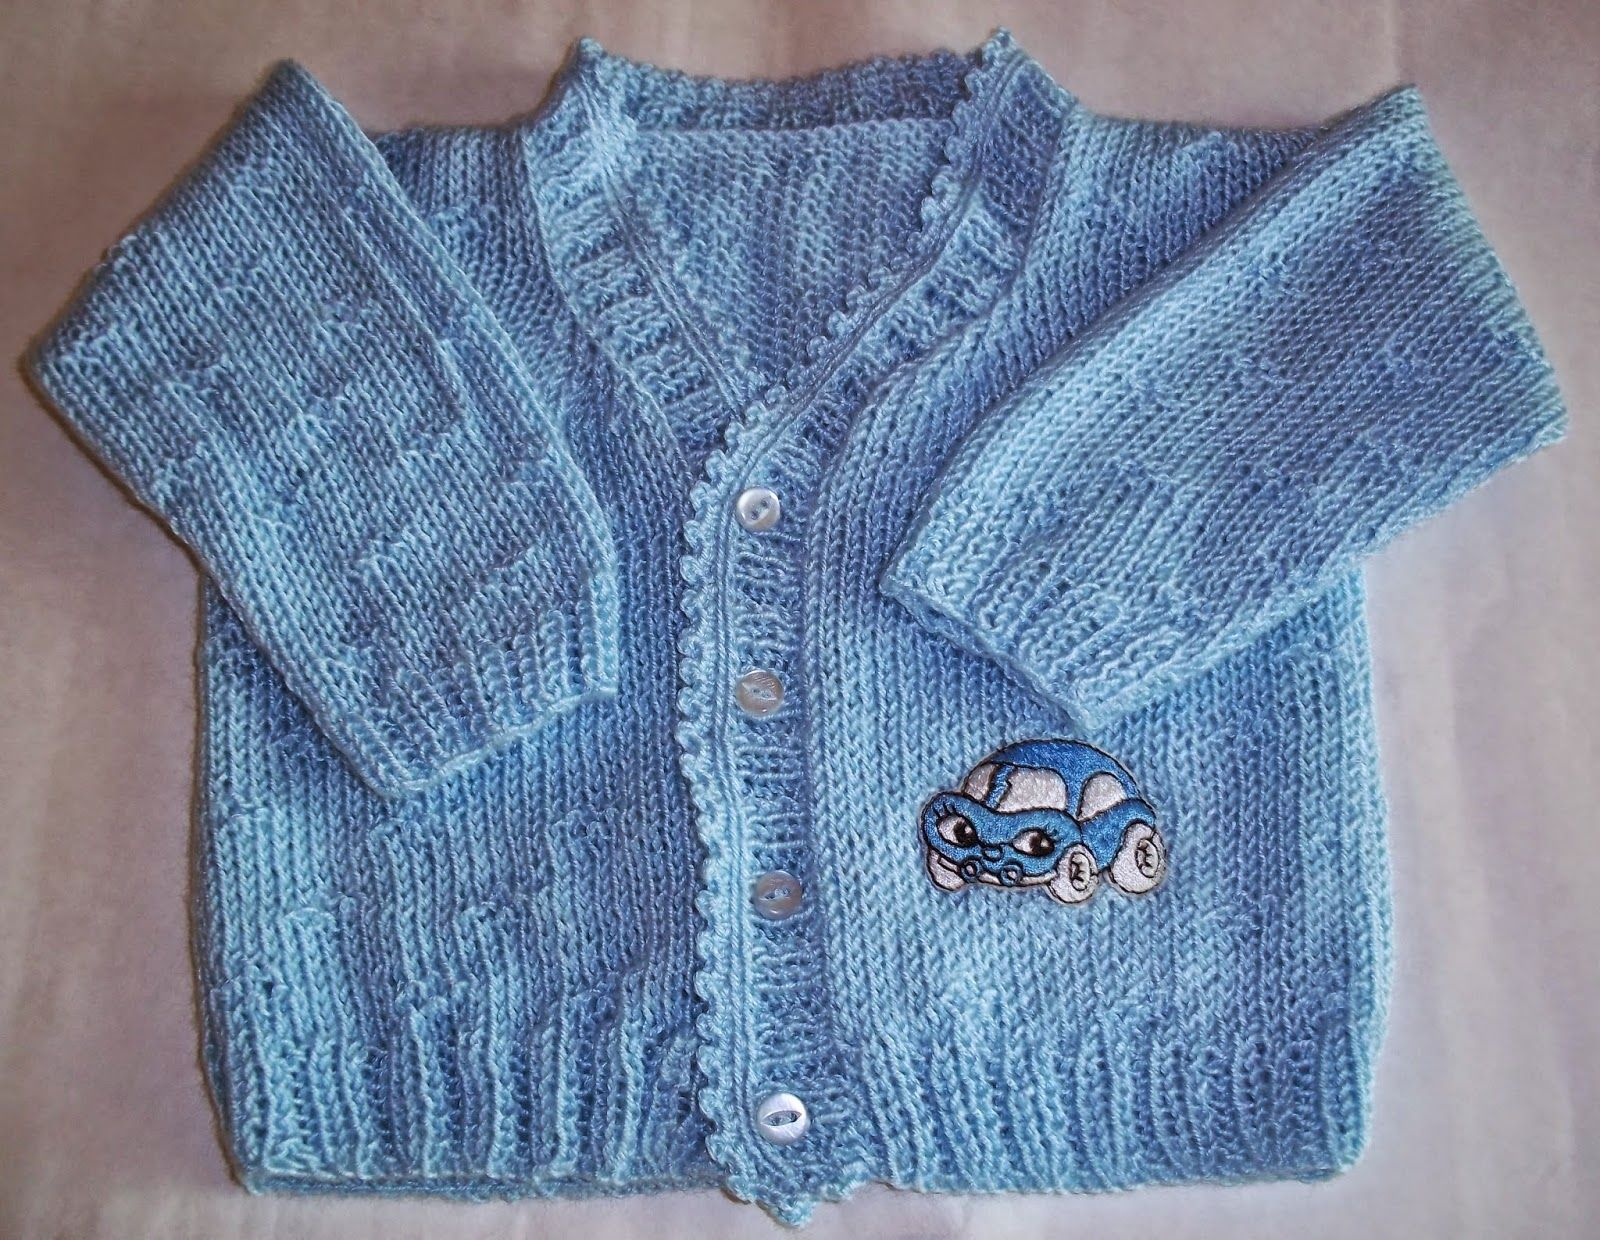 Tejidos artesanales con bordados carysol saco celeste para bebes de 3 6 meses con manga lar - Tejer chaqueta bebe 6 meses ...